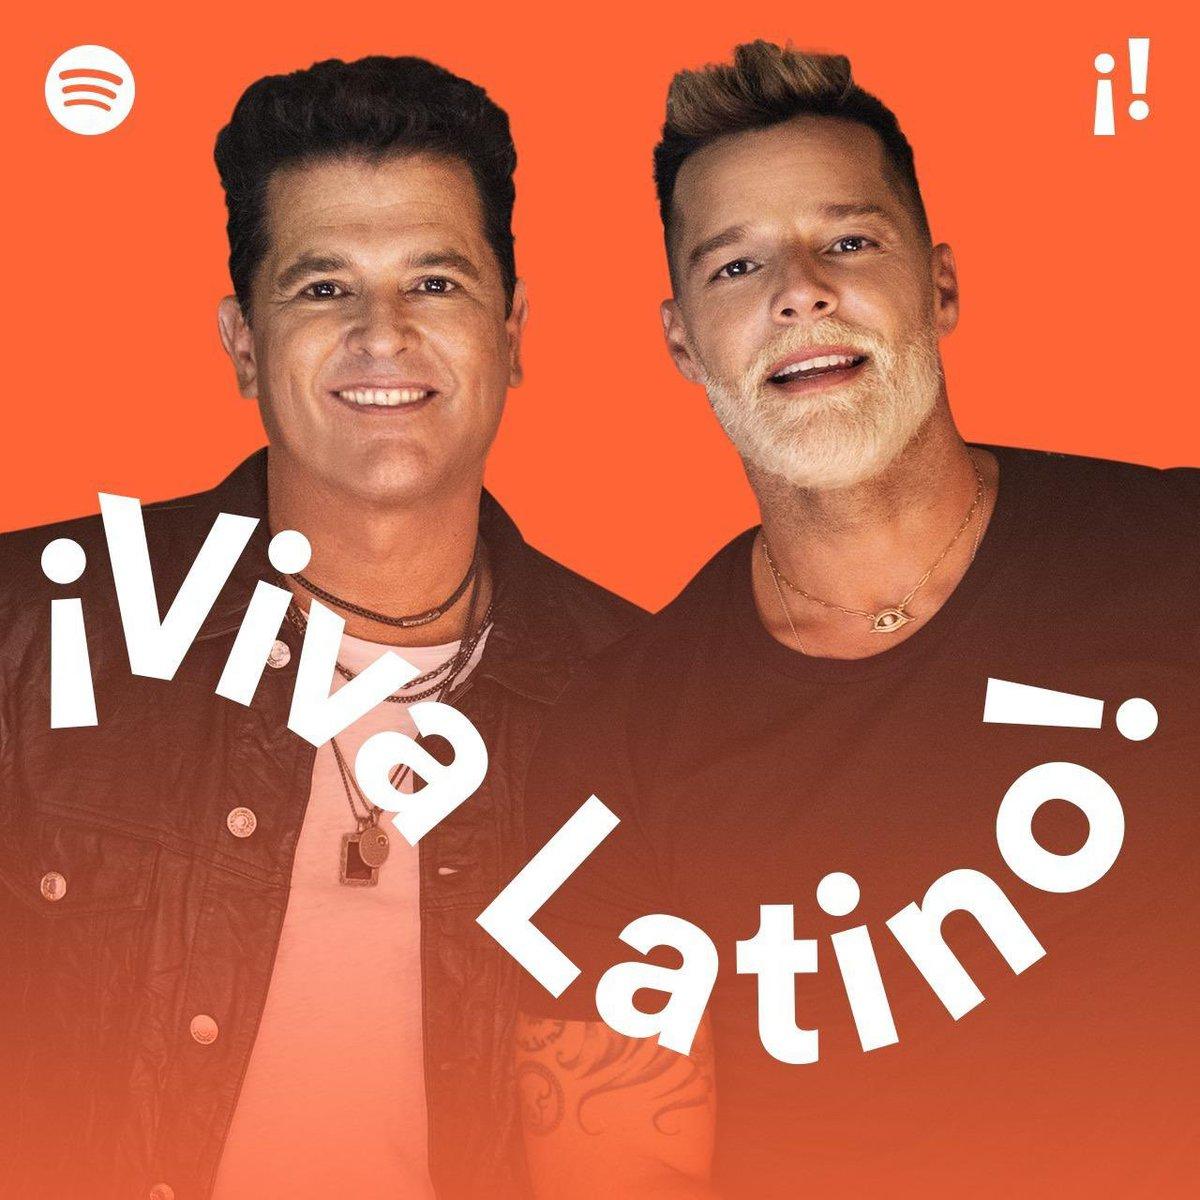 🎵Contigo desde Alaska a Buenos Aires Contigo desde Londres hasta Nueva York 🎵 #CancionBonita en #VivaLatino @Spotify @carlosvives